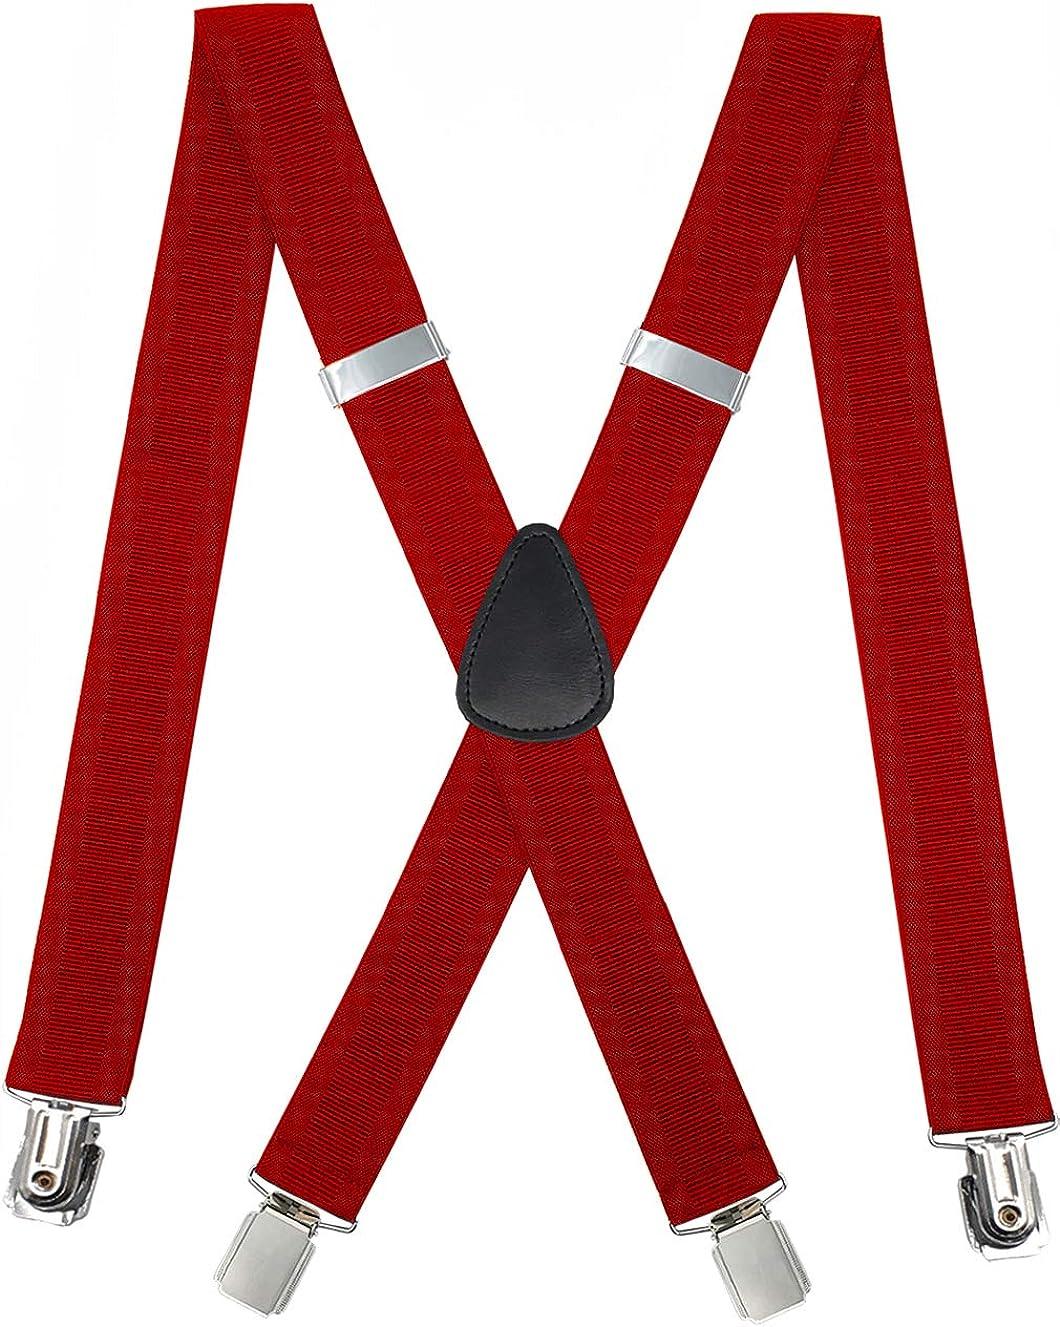 METUUTER Suspenders for Men – Heavy Duty Strong Clips Adjustable Elastic X Back Braces Big and Tall Men's Suspenders